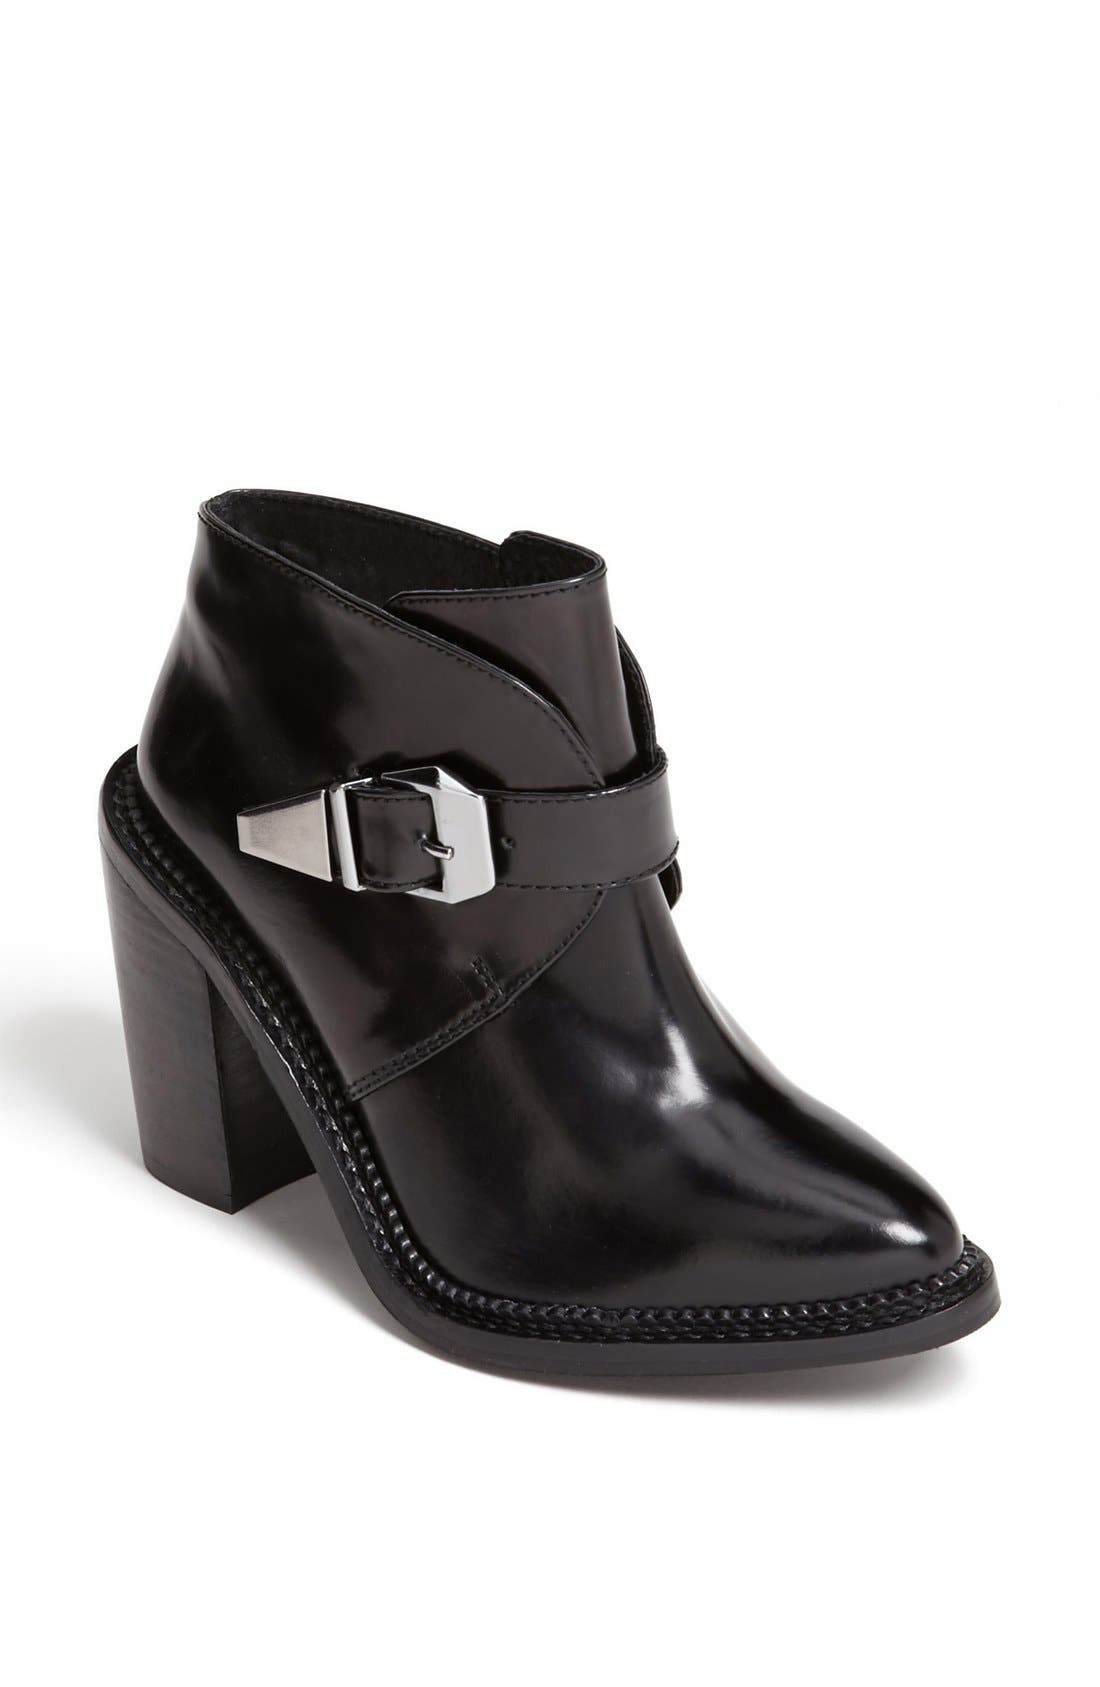 Main Image - Topshop 'Aleta' Monk Strap Boot